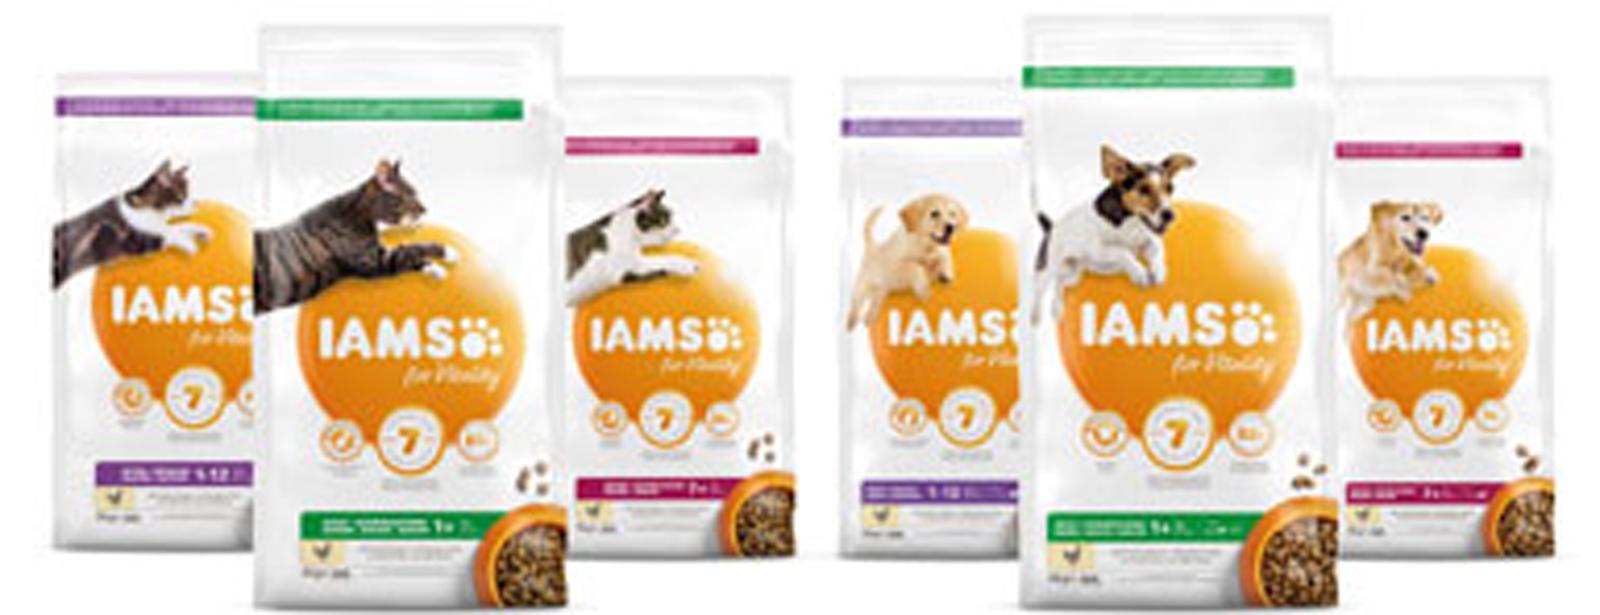 Schwedt Fauna - Das aktuelle IAMS Futtersortiment